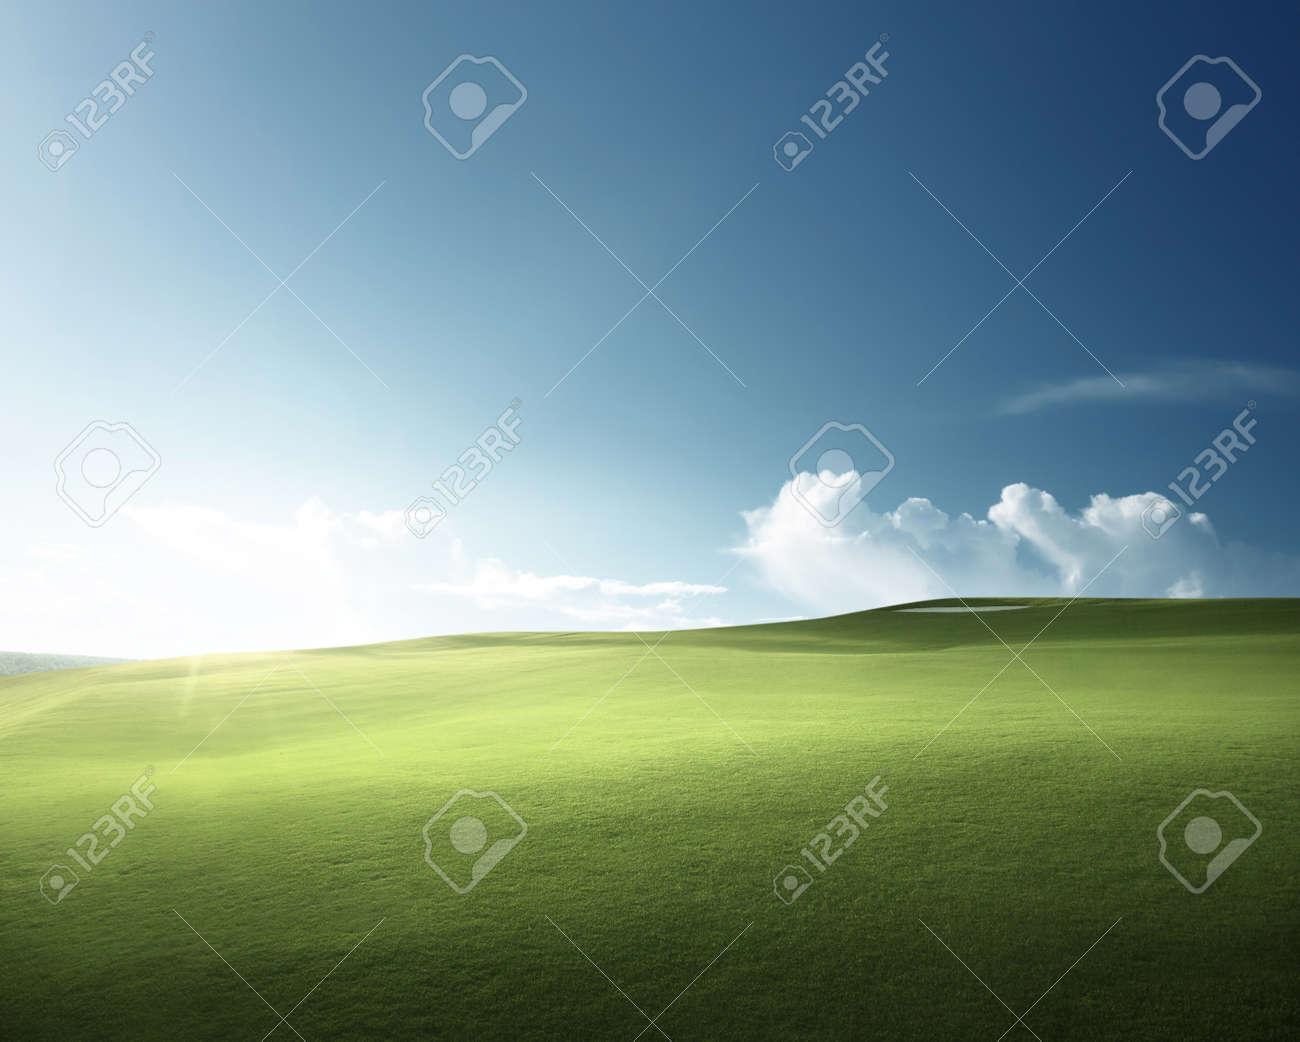 spring grass, golf field - 106587968